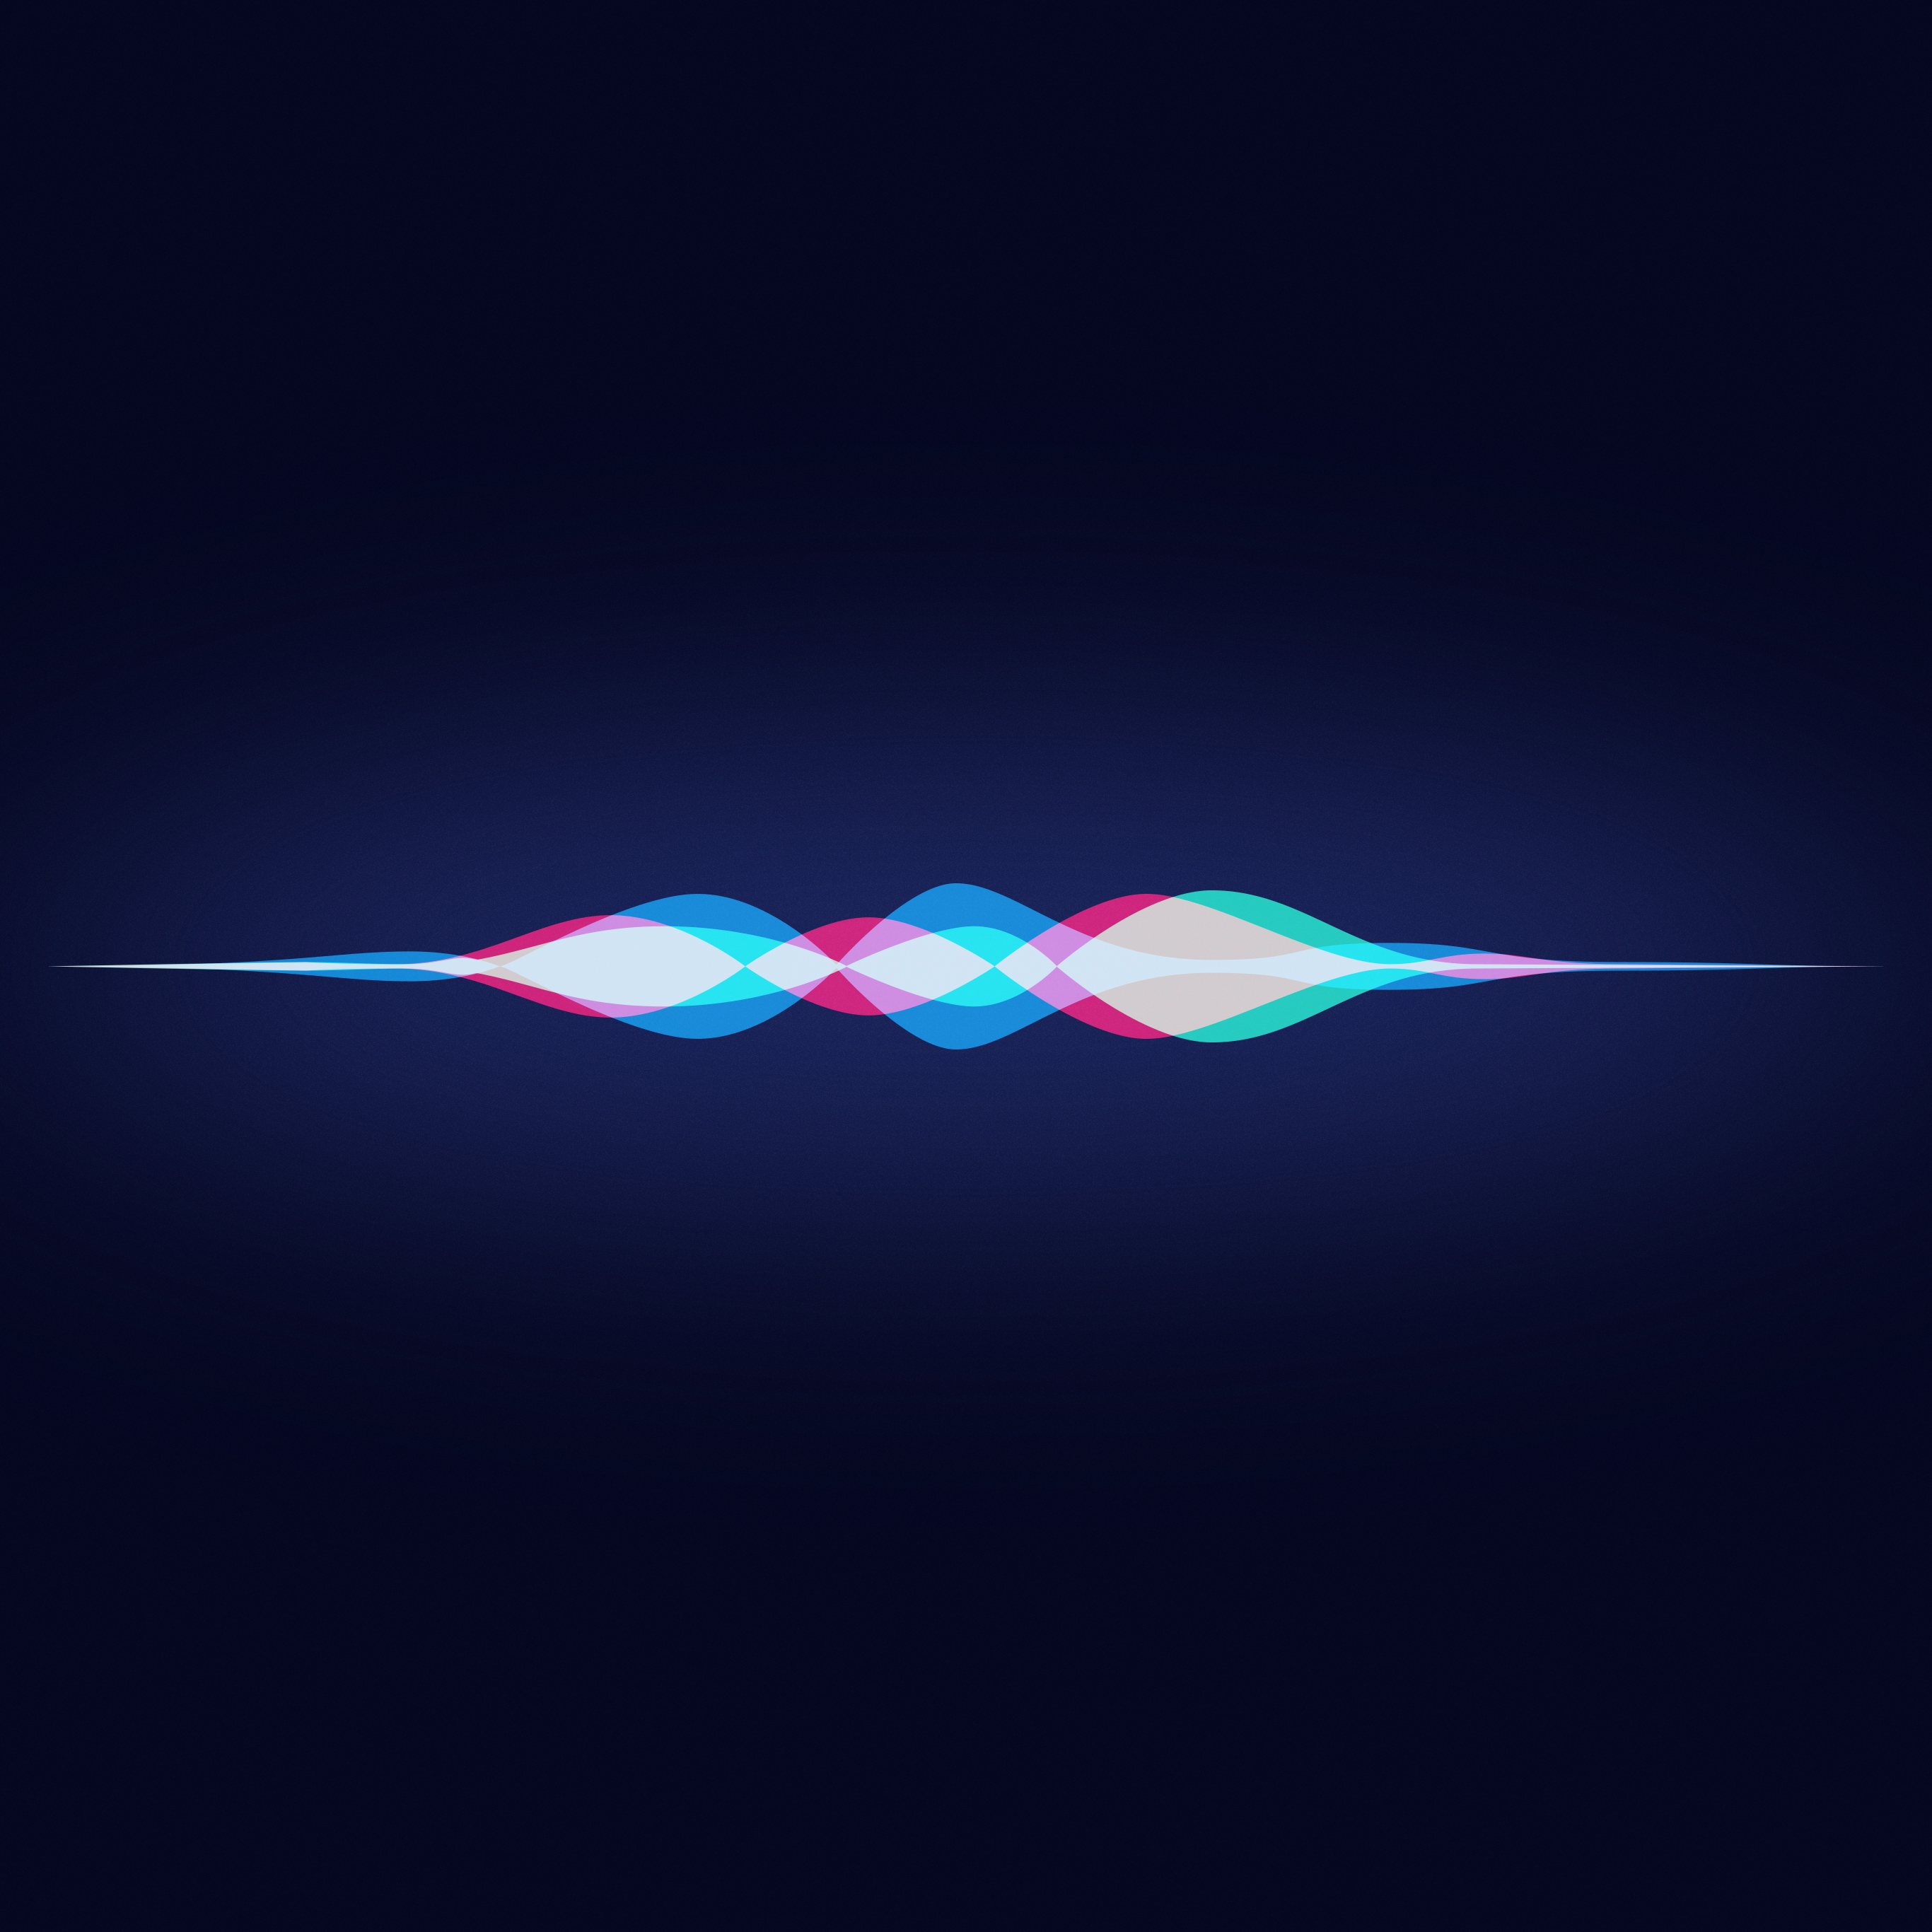 Hey-Siri-iPad-Pro-By-Jason-Zigrino-wallpaper